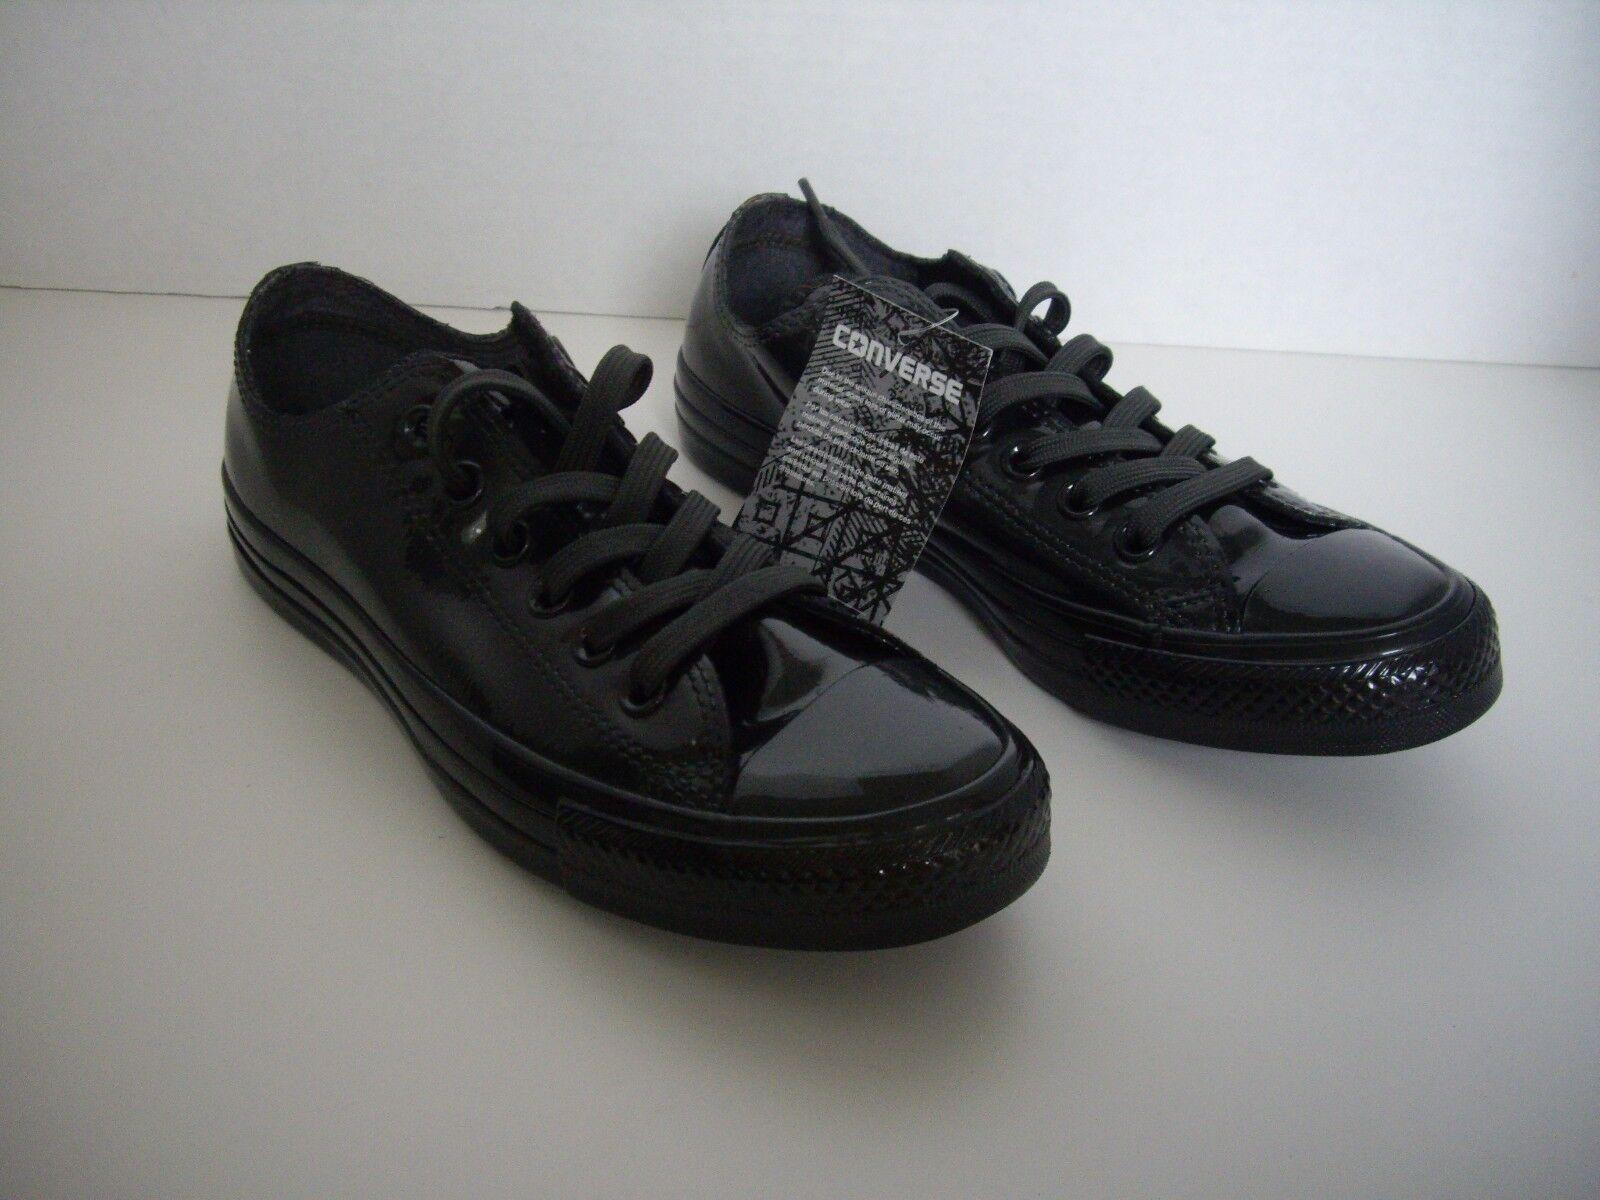 Converse Chuck Taylor Taylor Taylor All Star Zapatos Mujer Negro Metálico Perla, tamaño 7M  venderse como panqueques